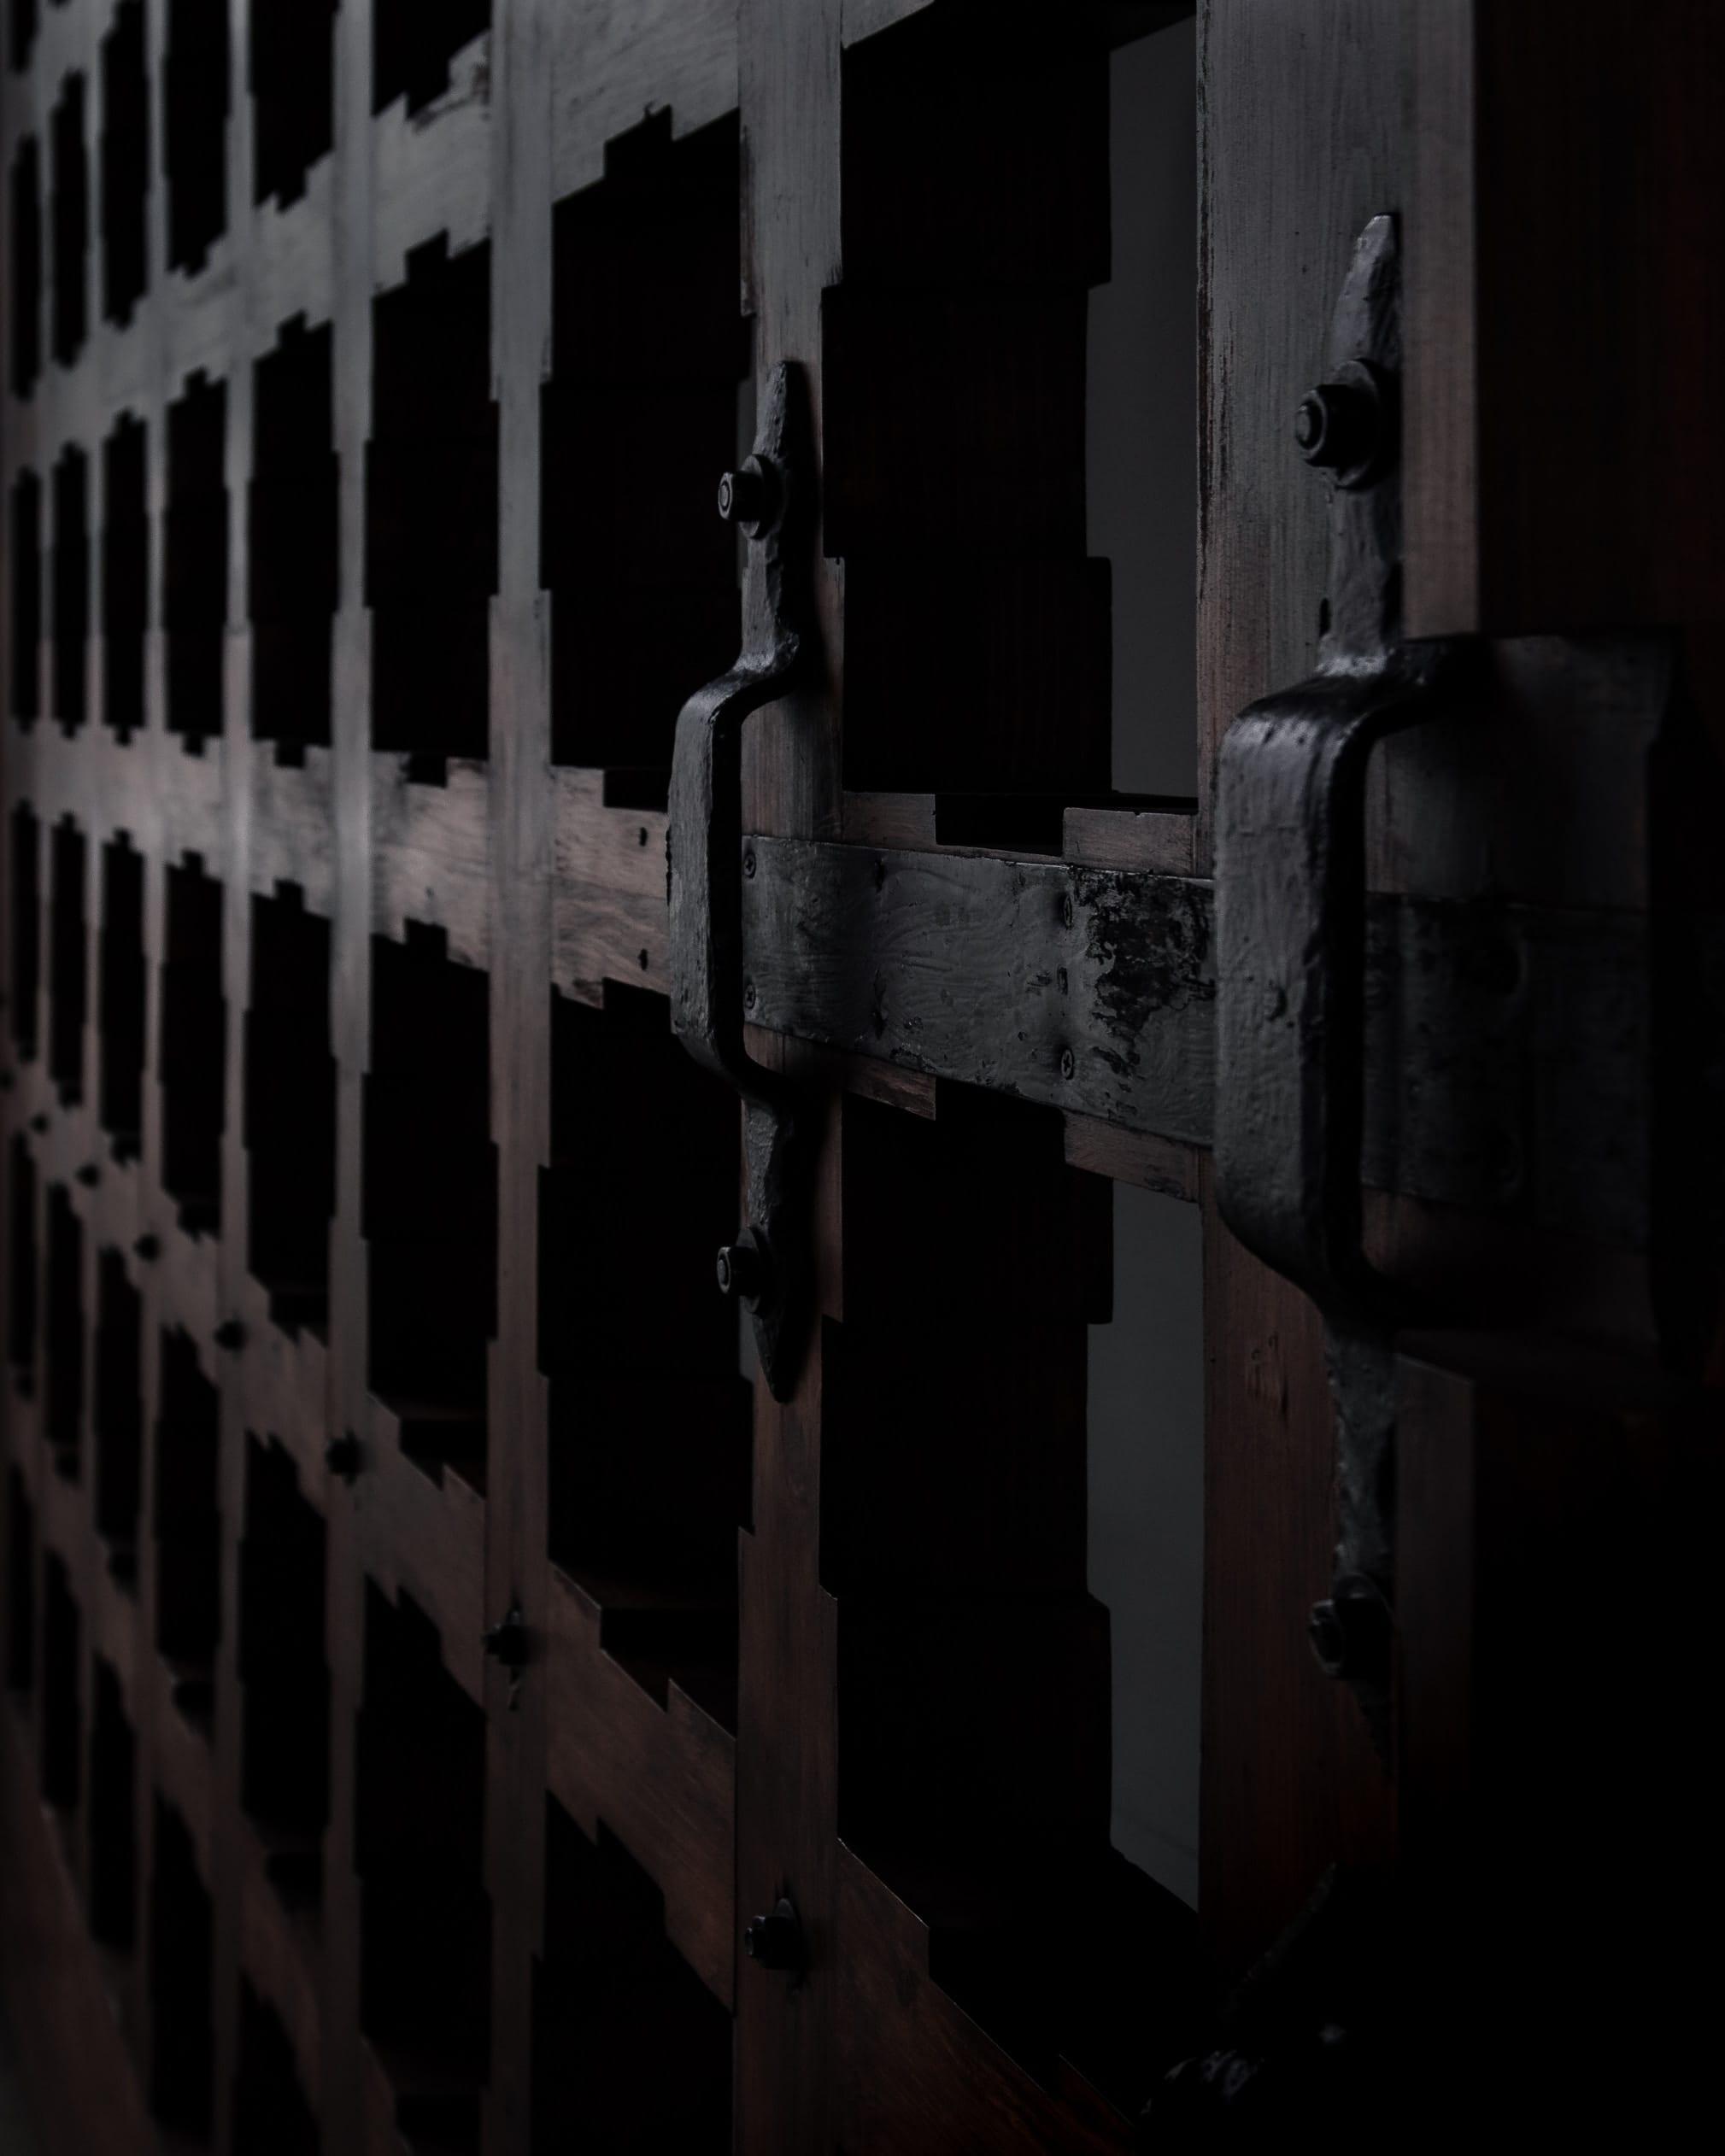 Michigan's Tuition Reimbursement Program Will Extend to Inmates